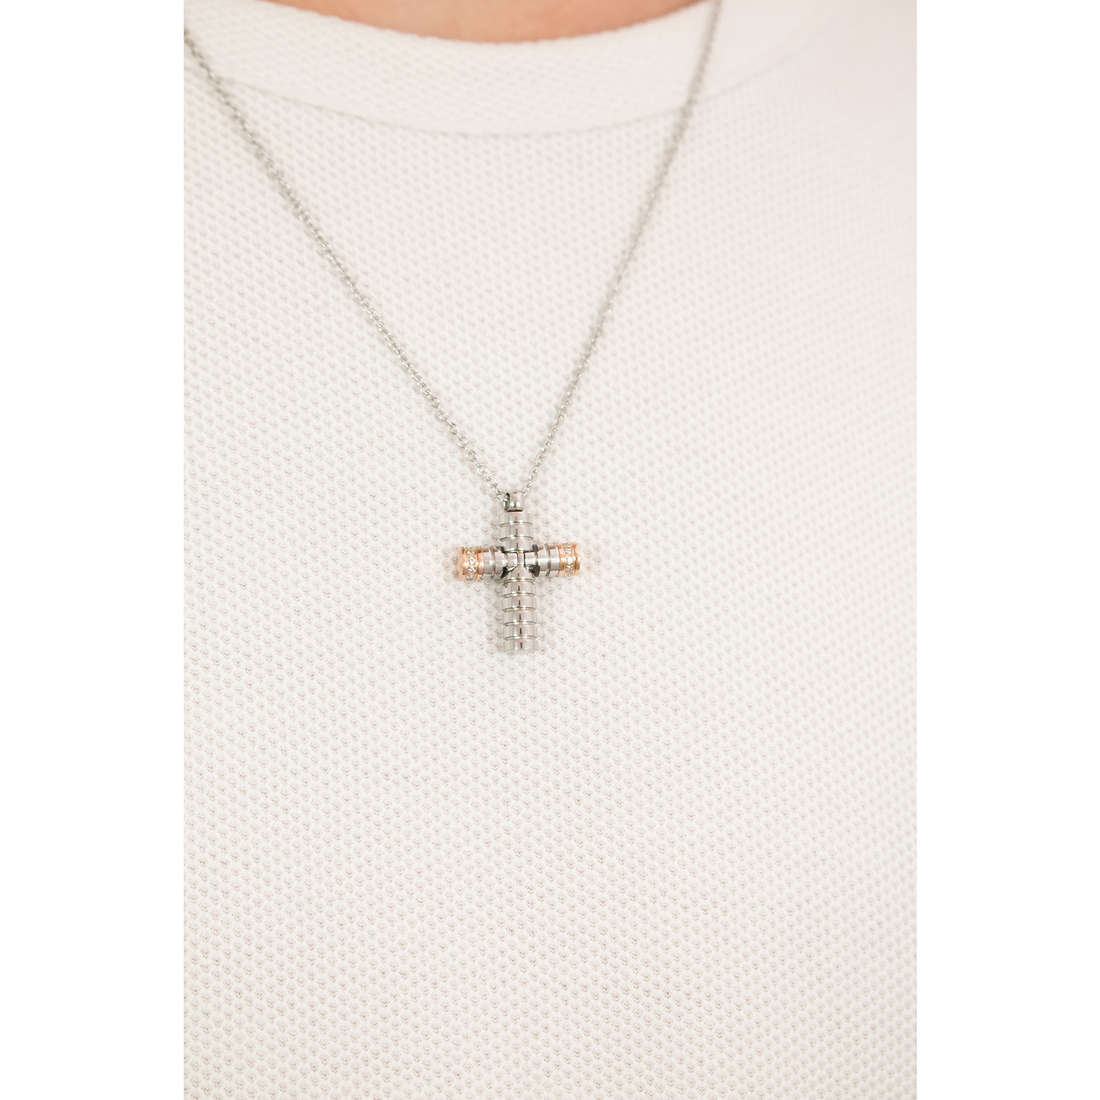 Luca Barra necklaces Religion Soul man LBCA383 photo wearing